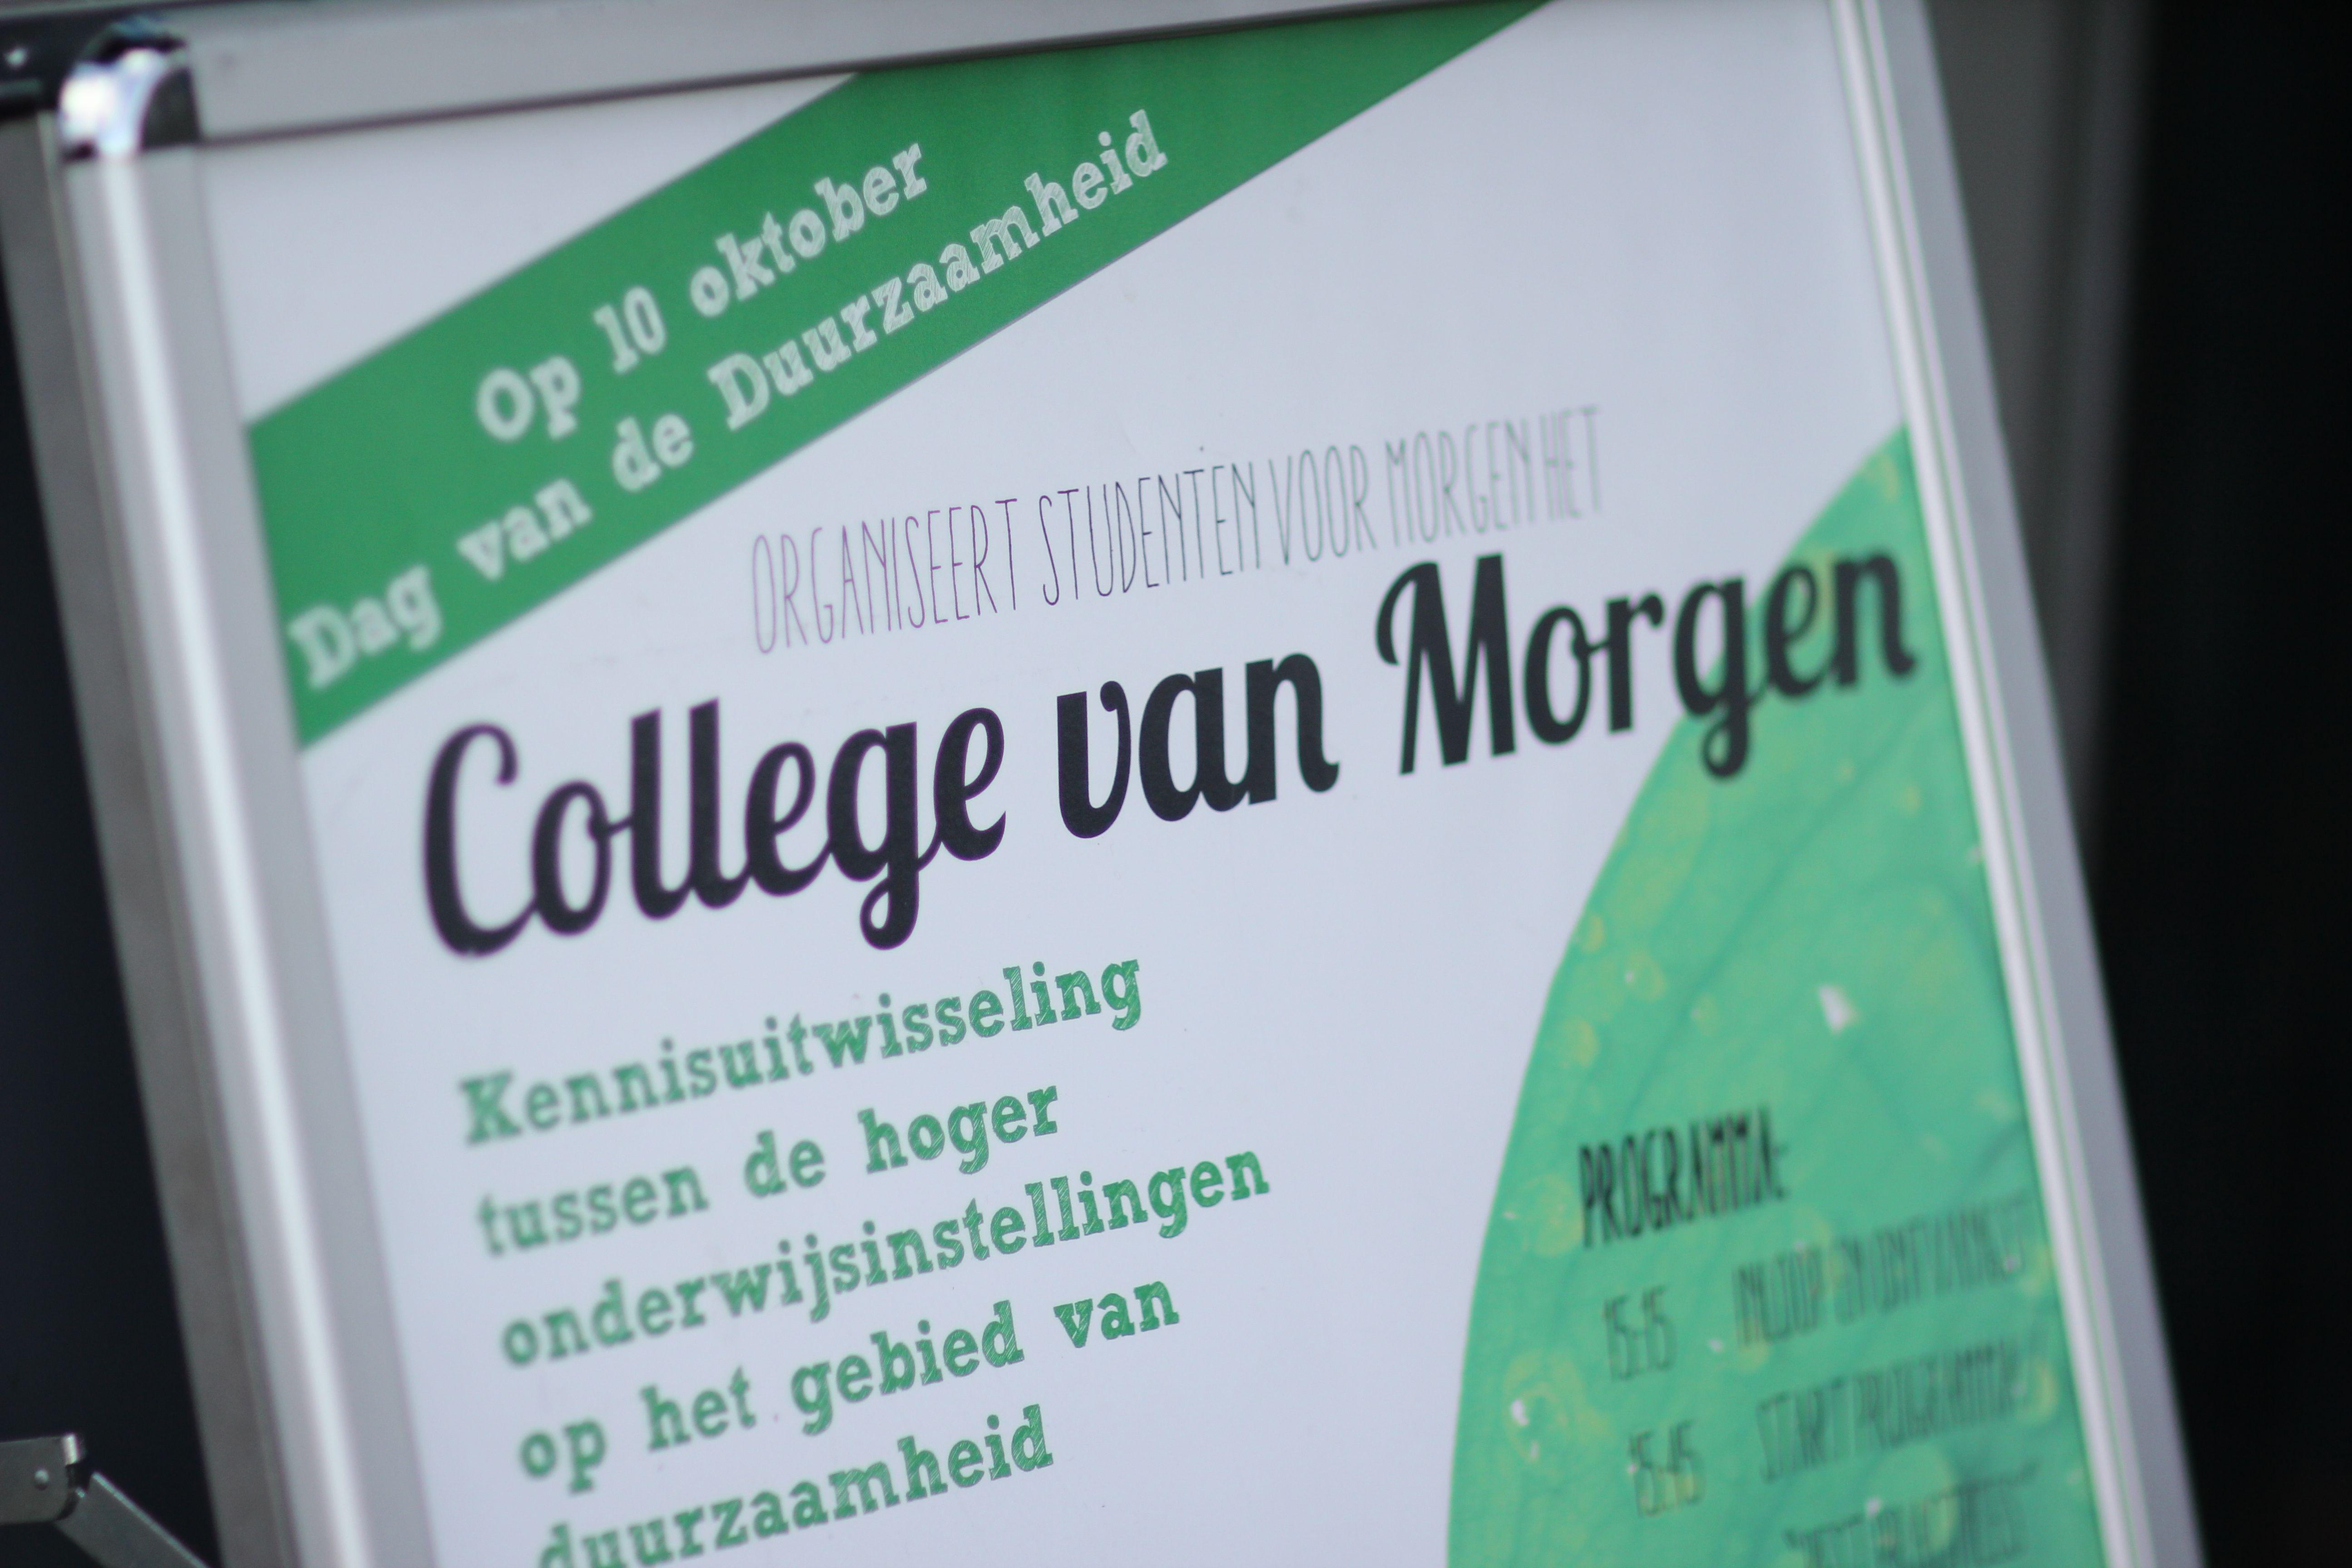 College Van Morgen Enorm Succes!